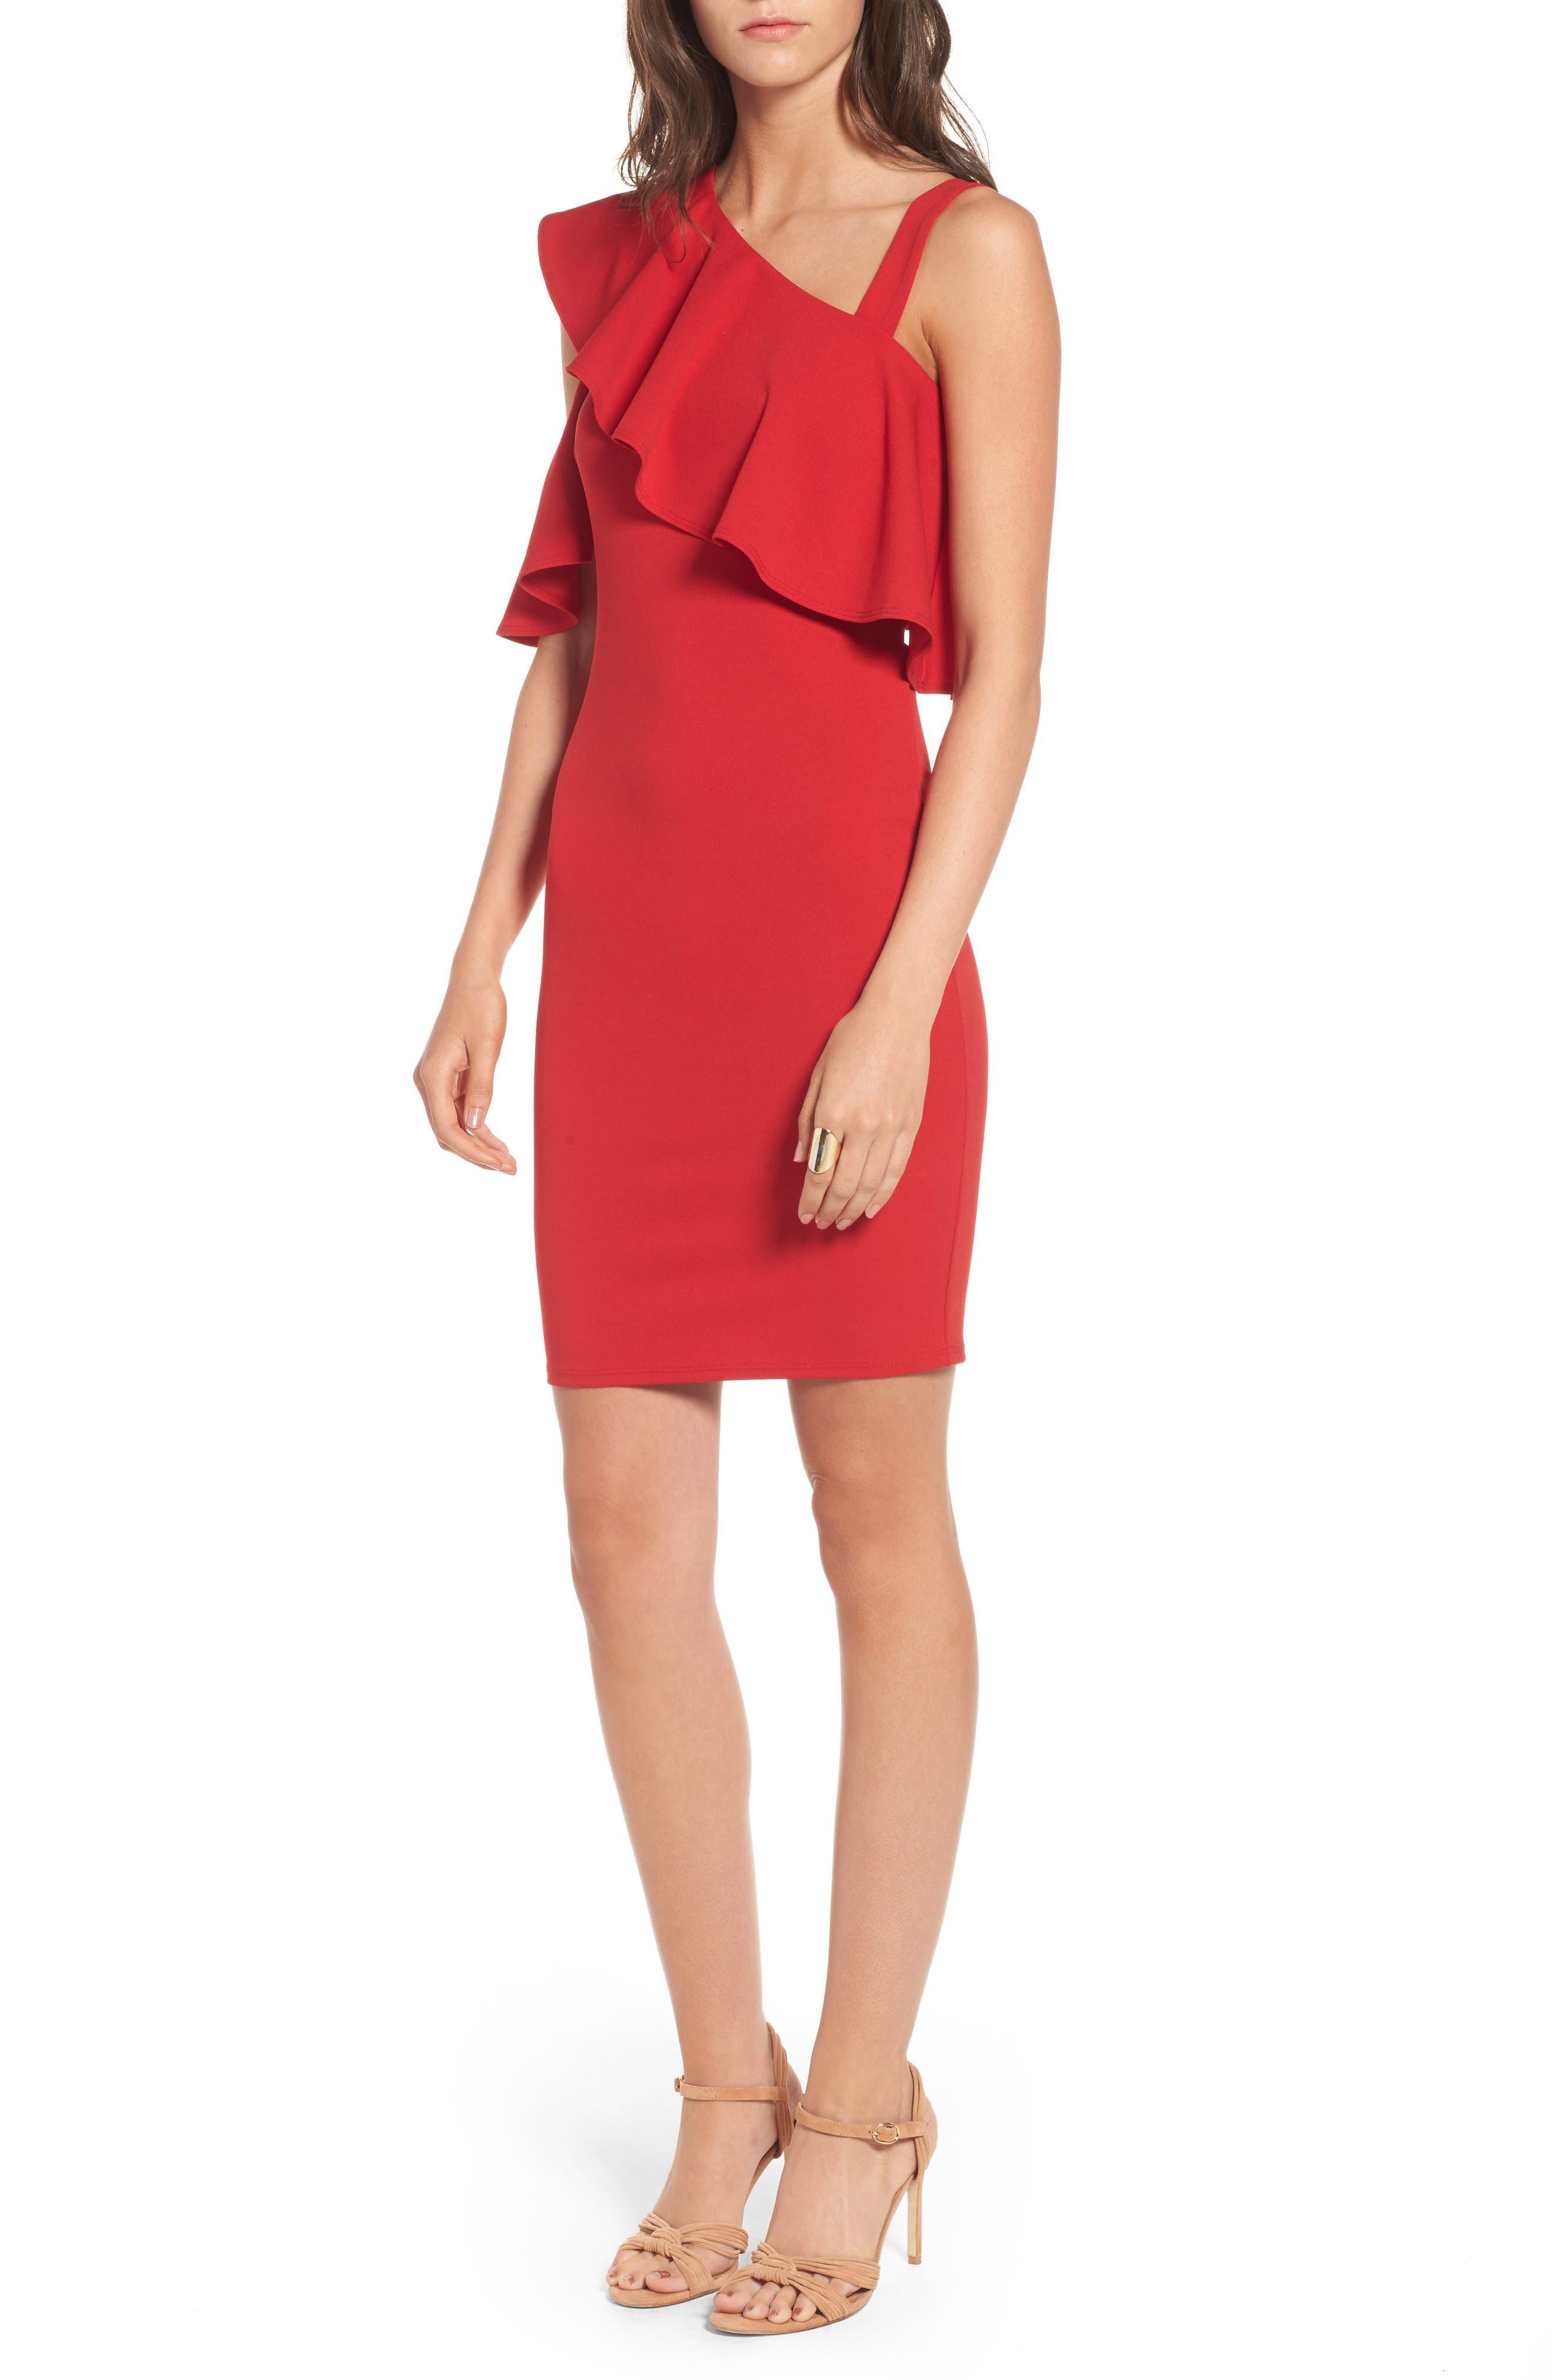 Soprano Ruffle One-Shoulder Body-Con Dress